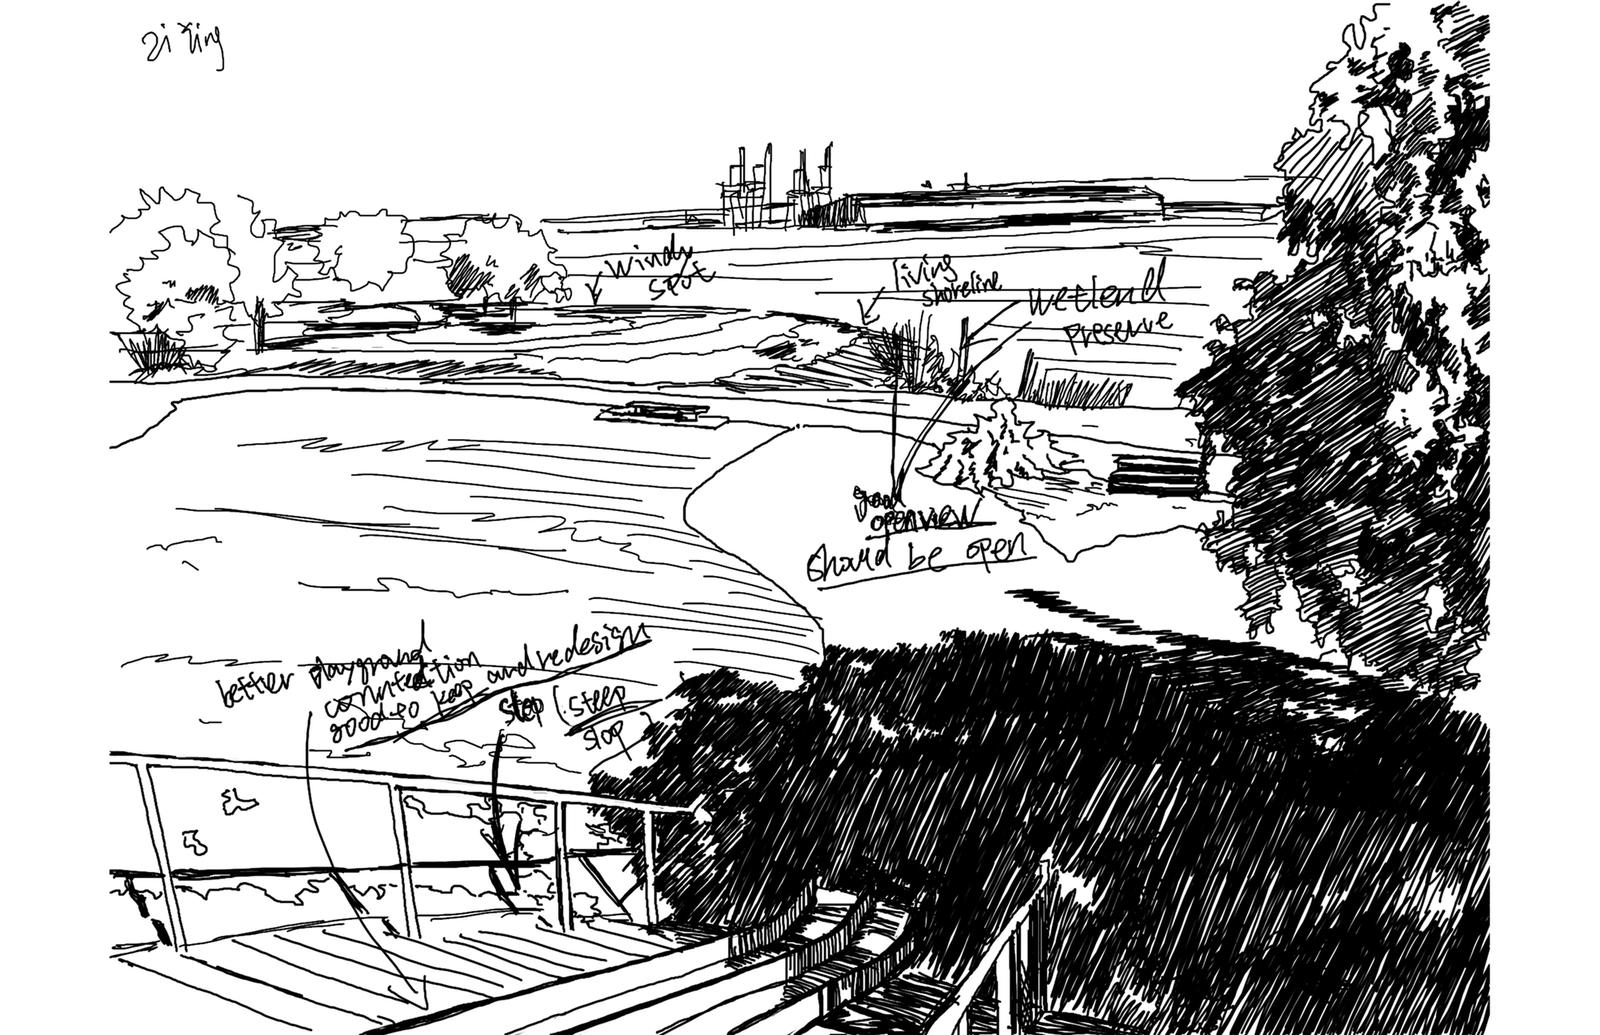 Site Analysis Sketch 4 – India Basin Park, San Francisco